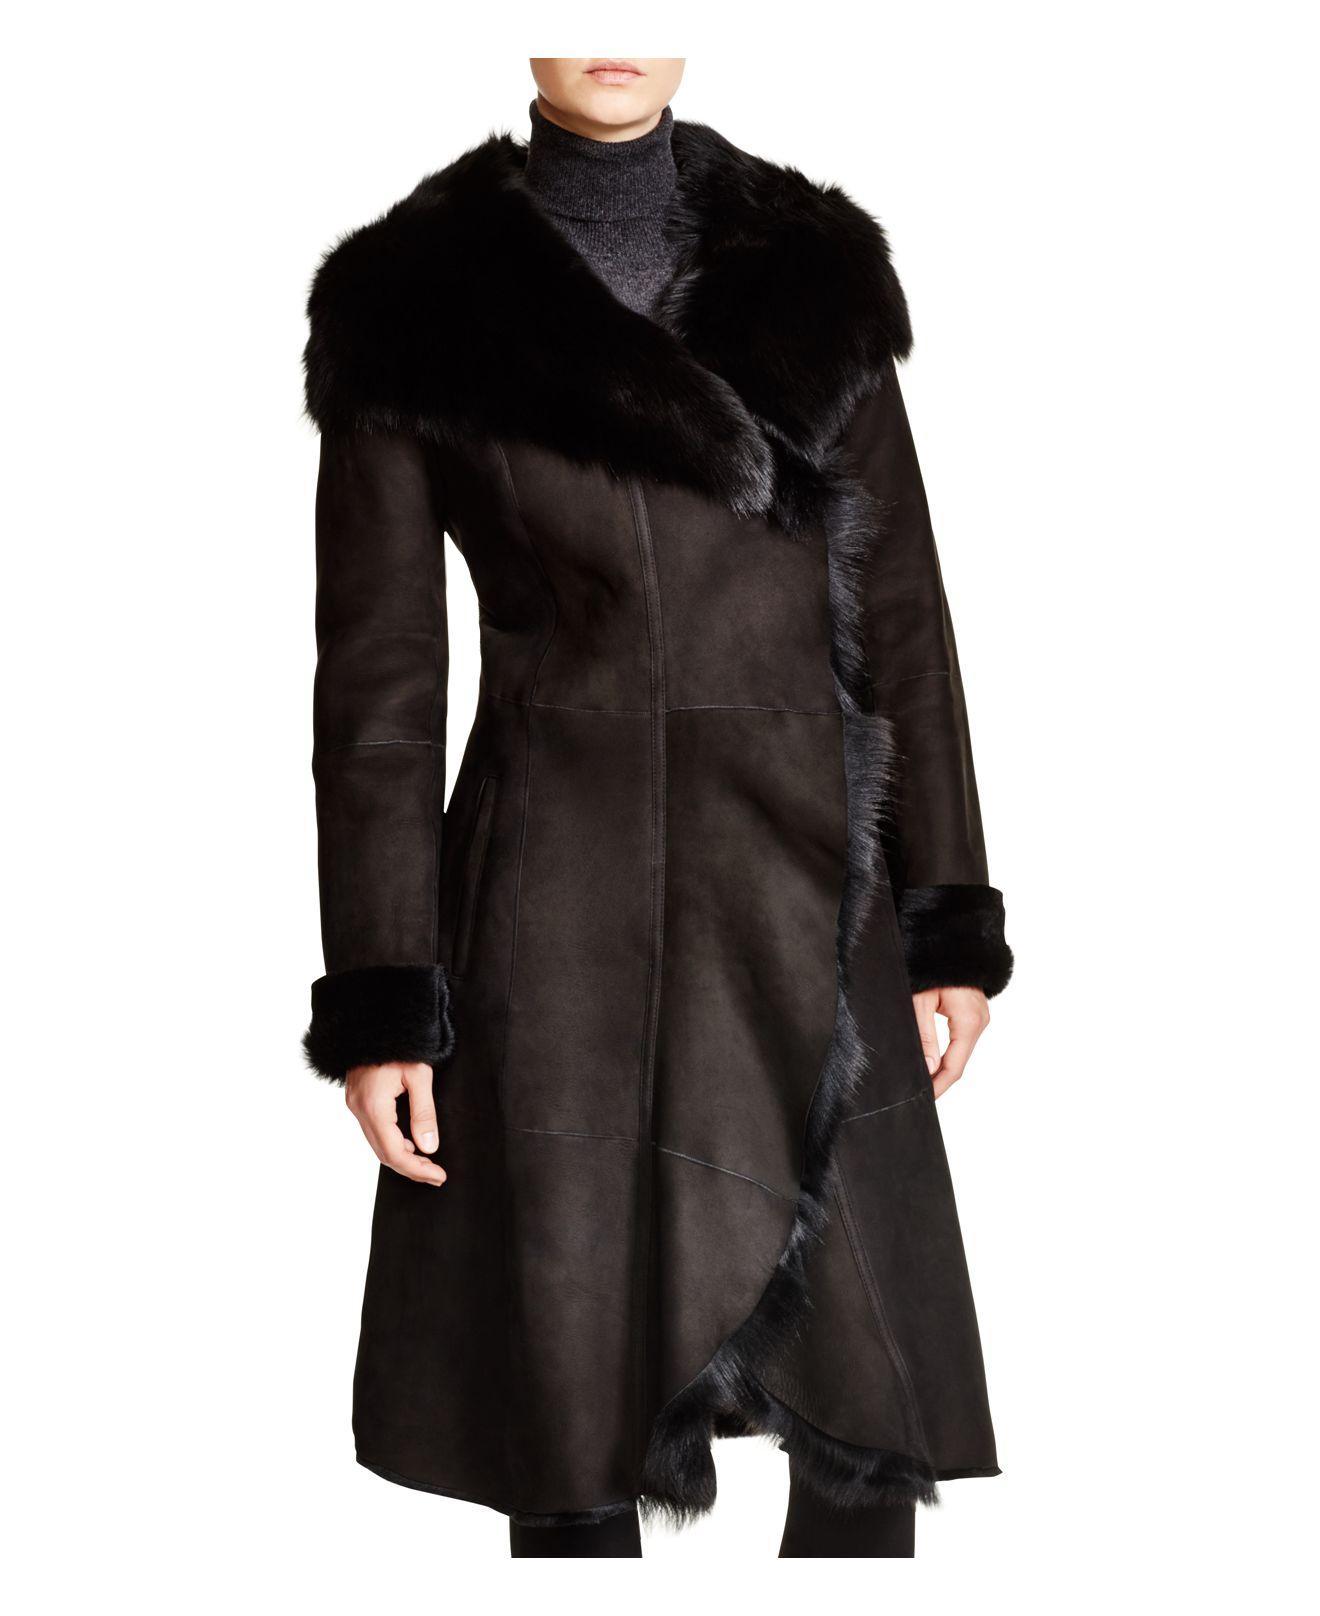 Maximilian Maximilian Shearling Coat With Toscana Collar in Black ...